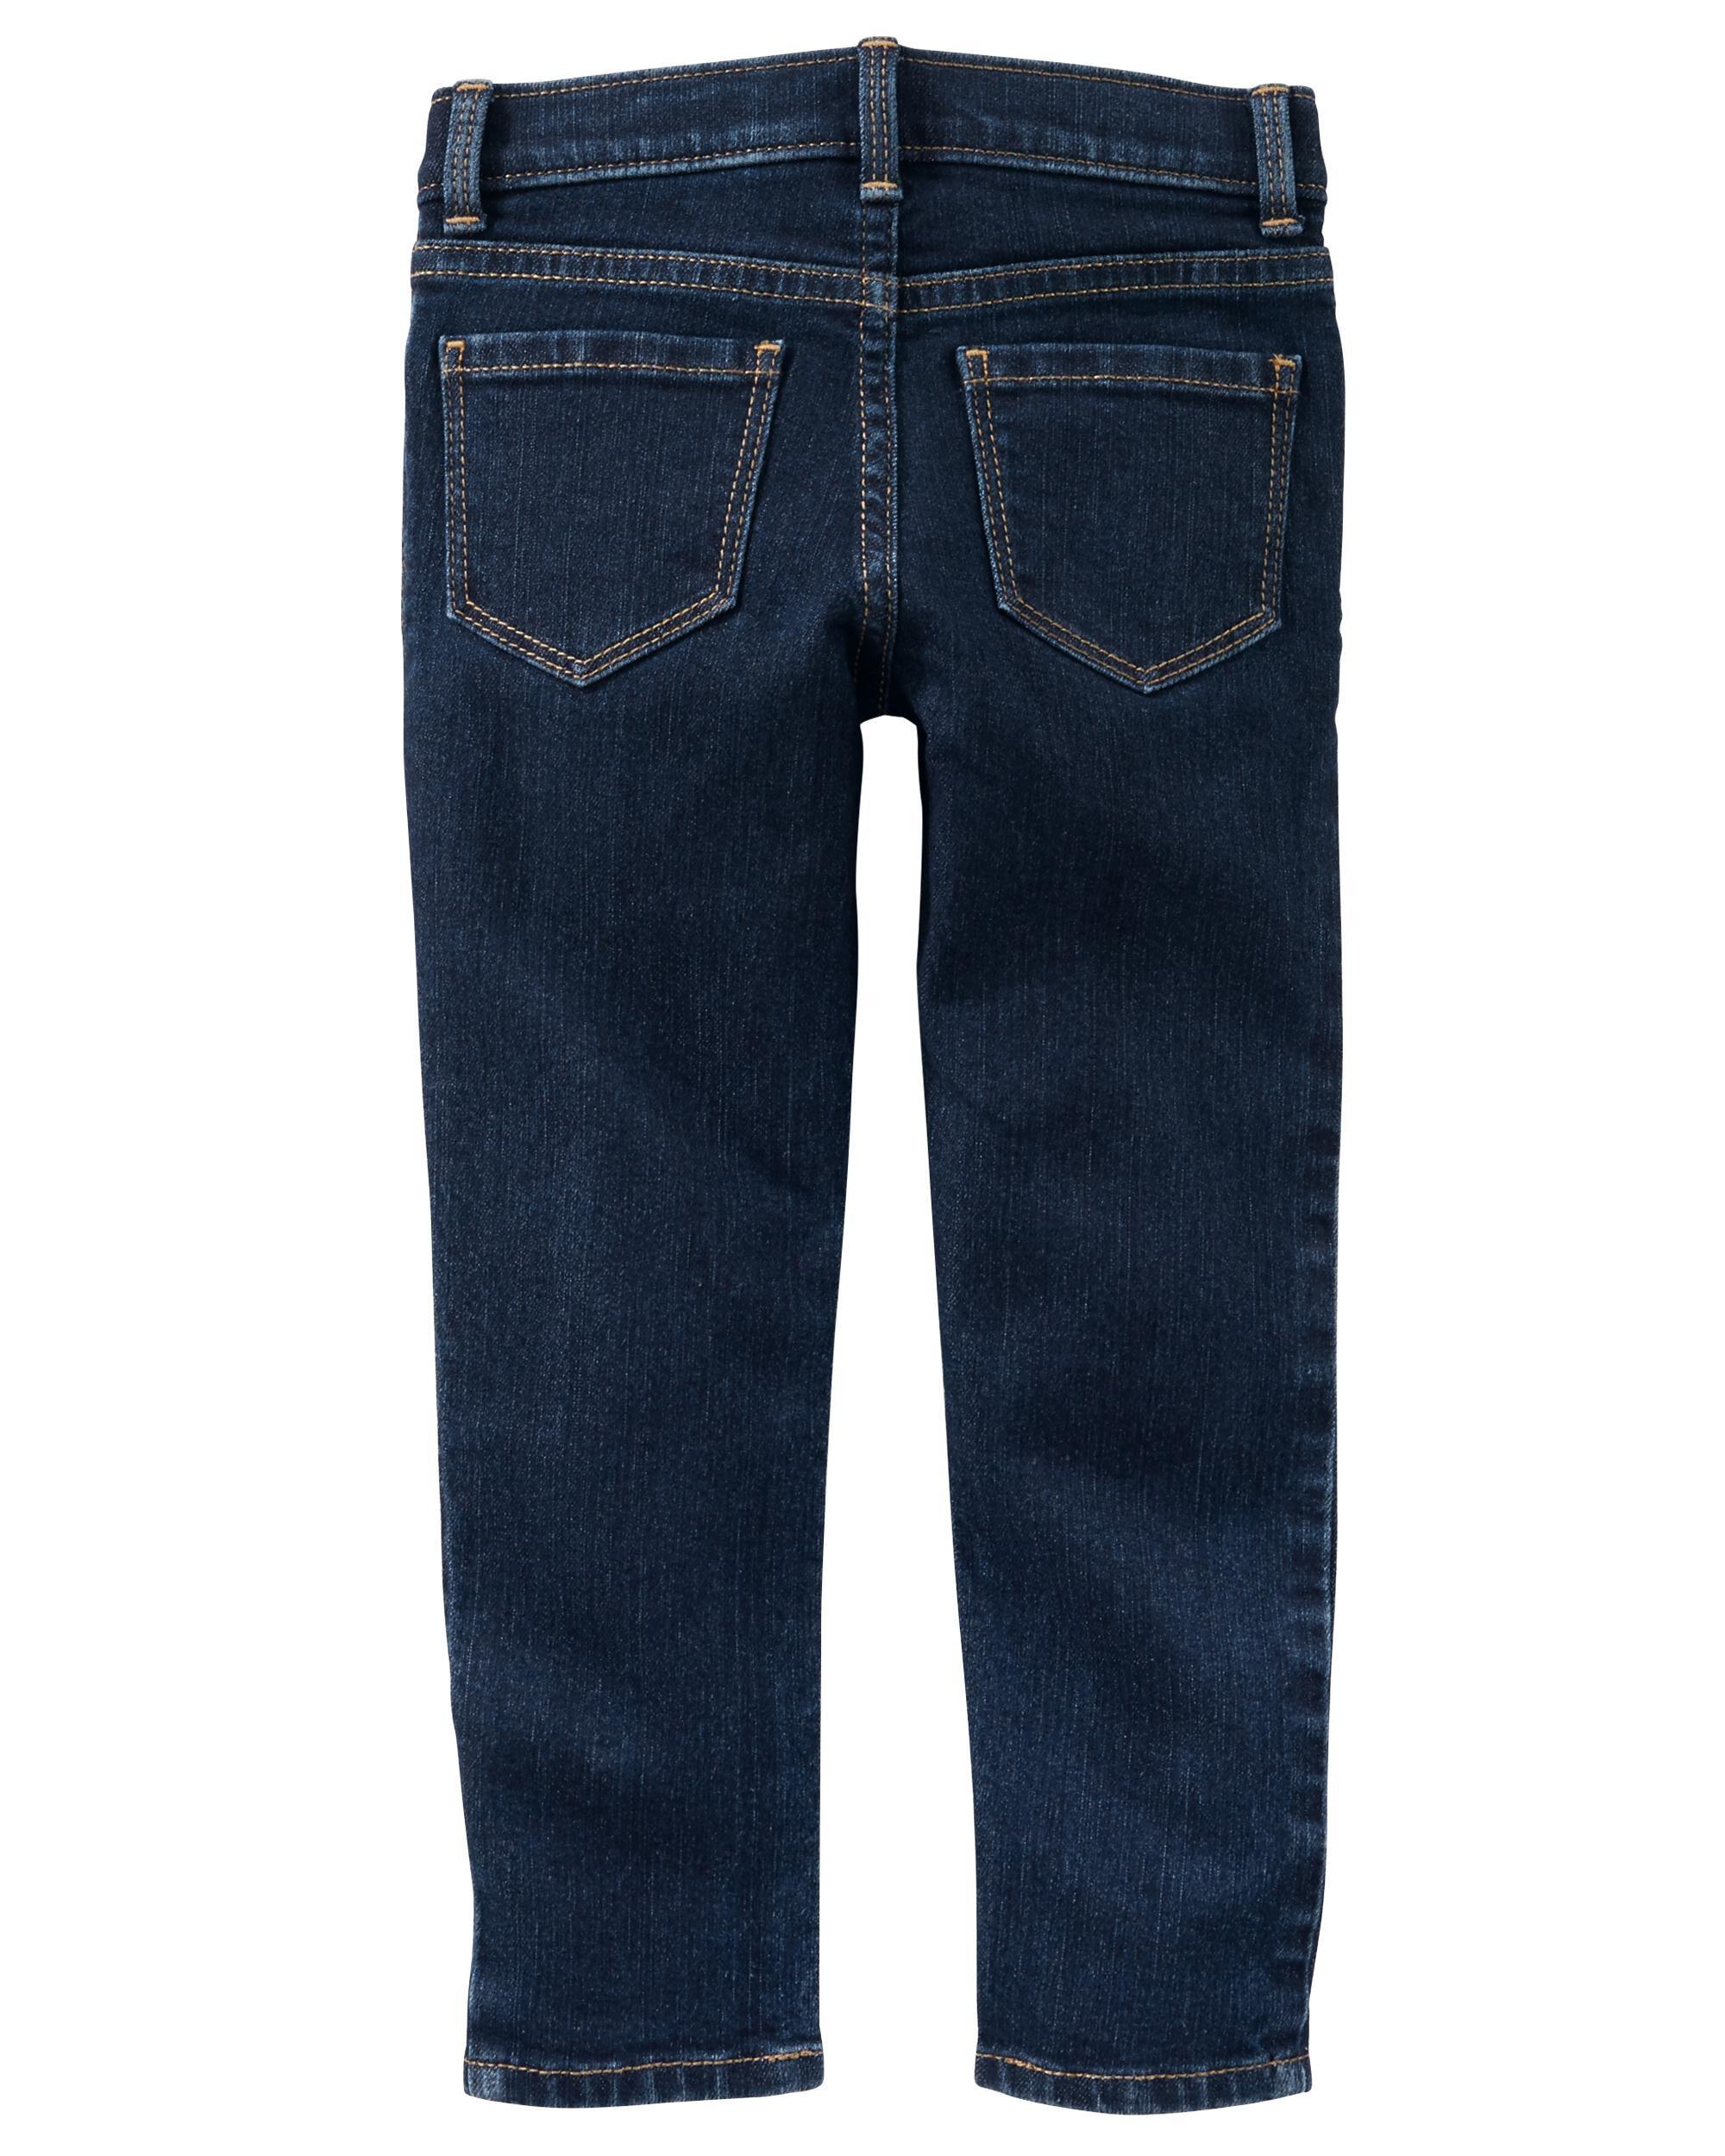 Super Skinny Jeans - Heritage Rinse Wash | OshKosh.com